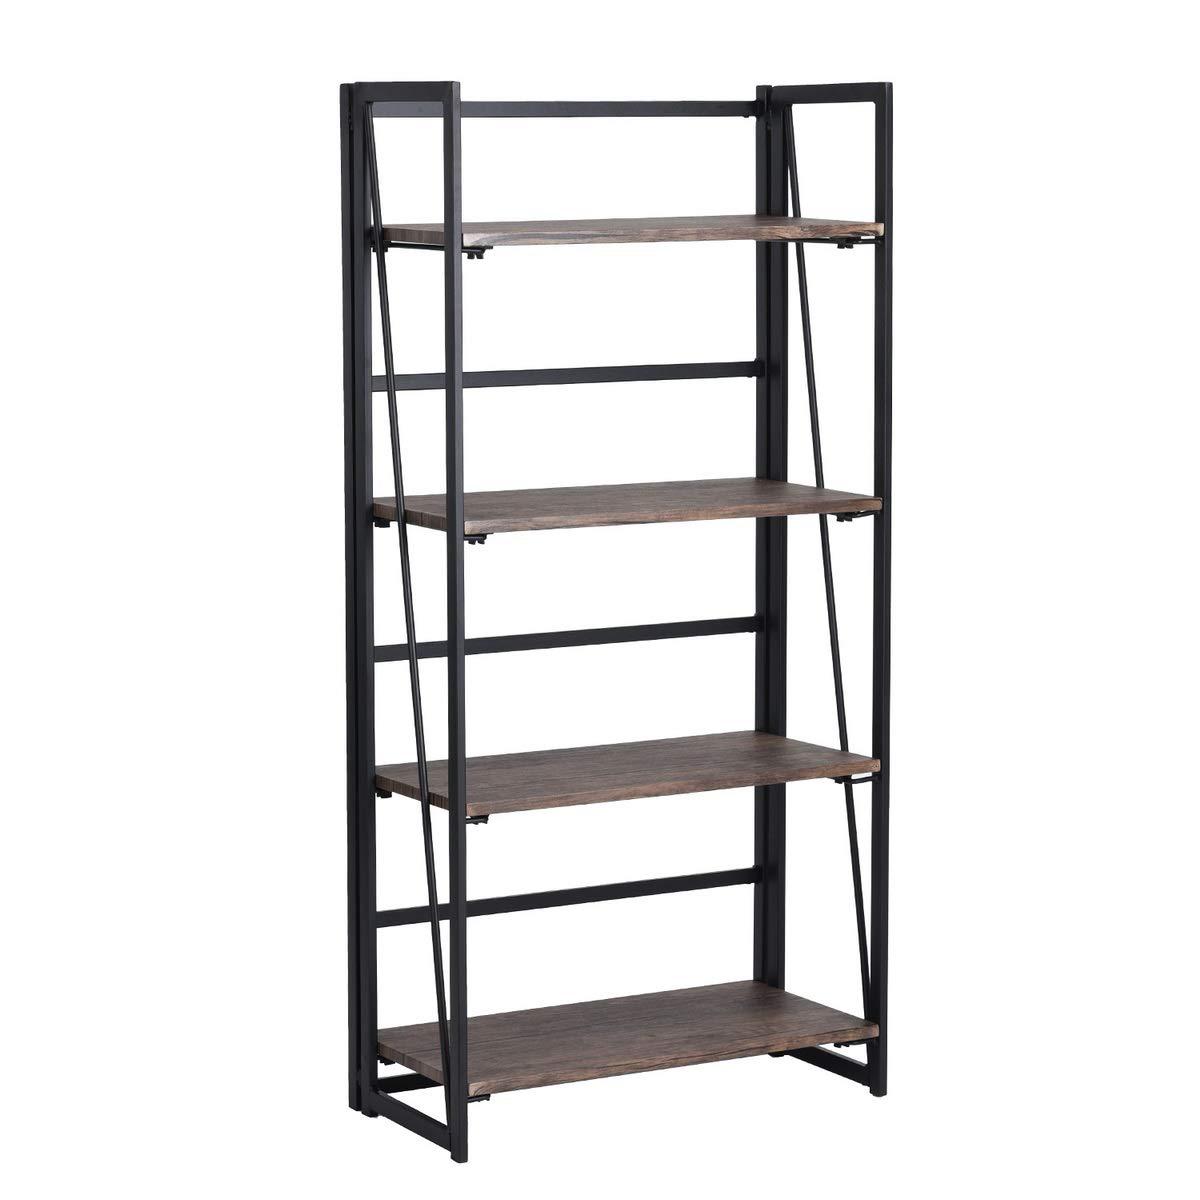 HomyCasa 4-Tier Bookshelf,Industrial Folding Ladder Bookshelf,Portable Bookcase,Home Office Wood Storage Shelves with Sturdy Metal Frame,Brown